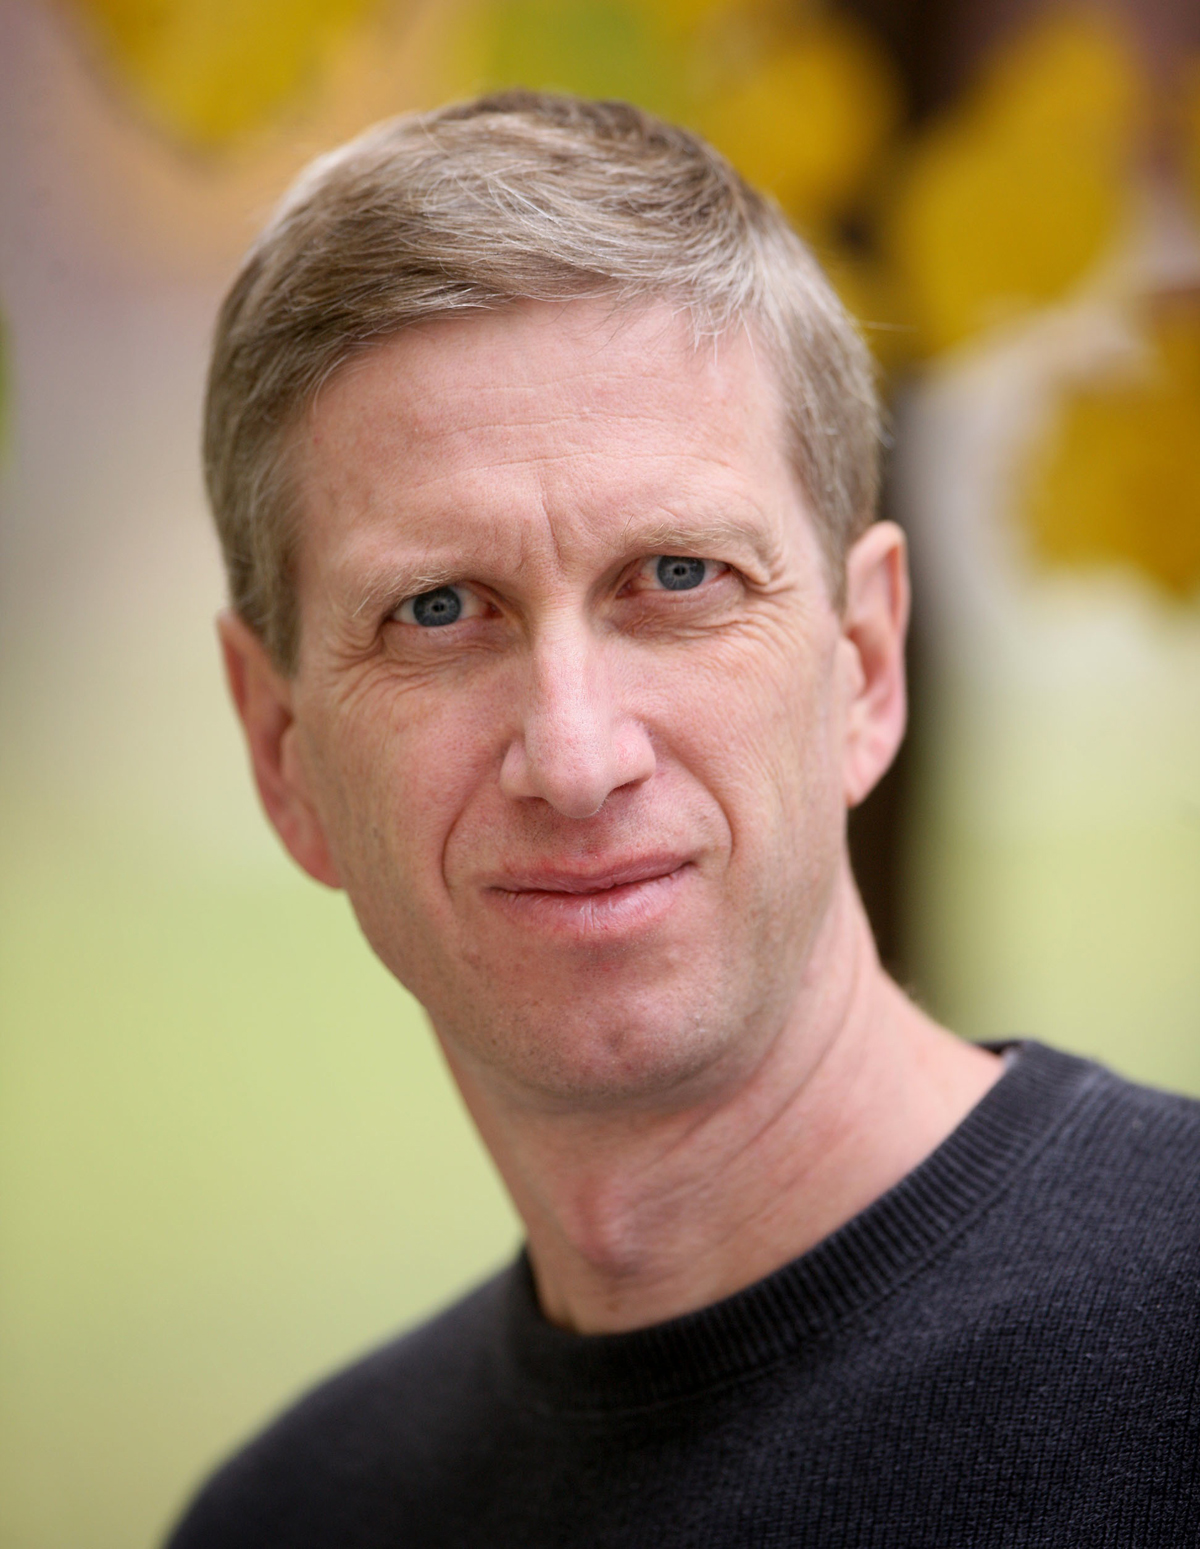 Andres Villu Maricq, University of Utah professor of biology